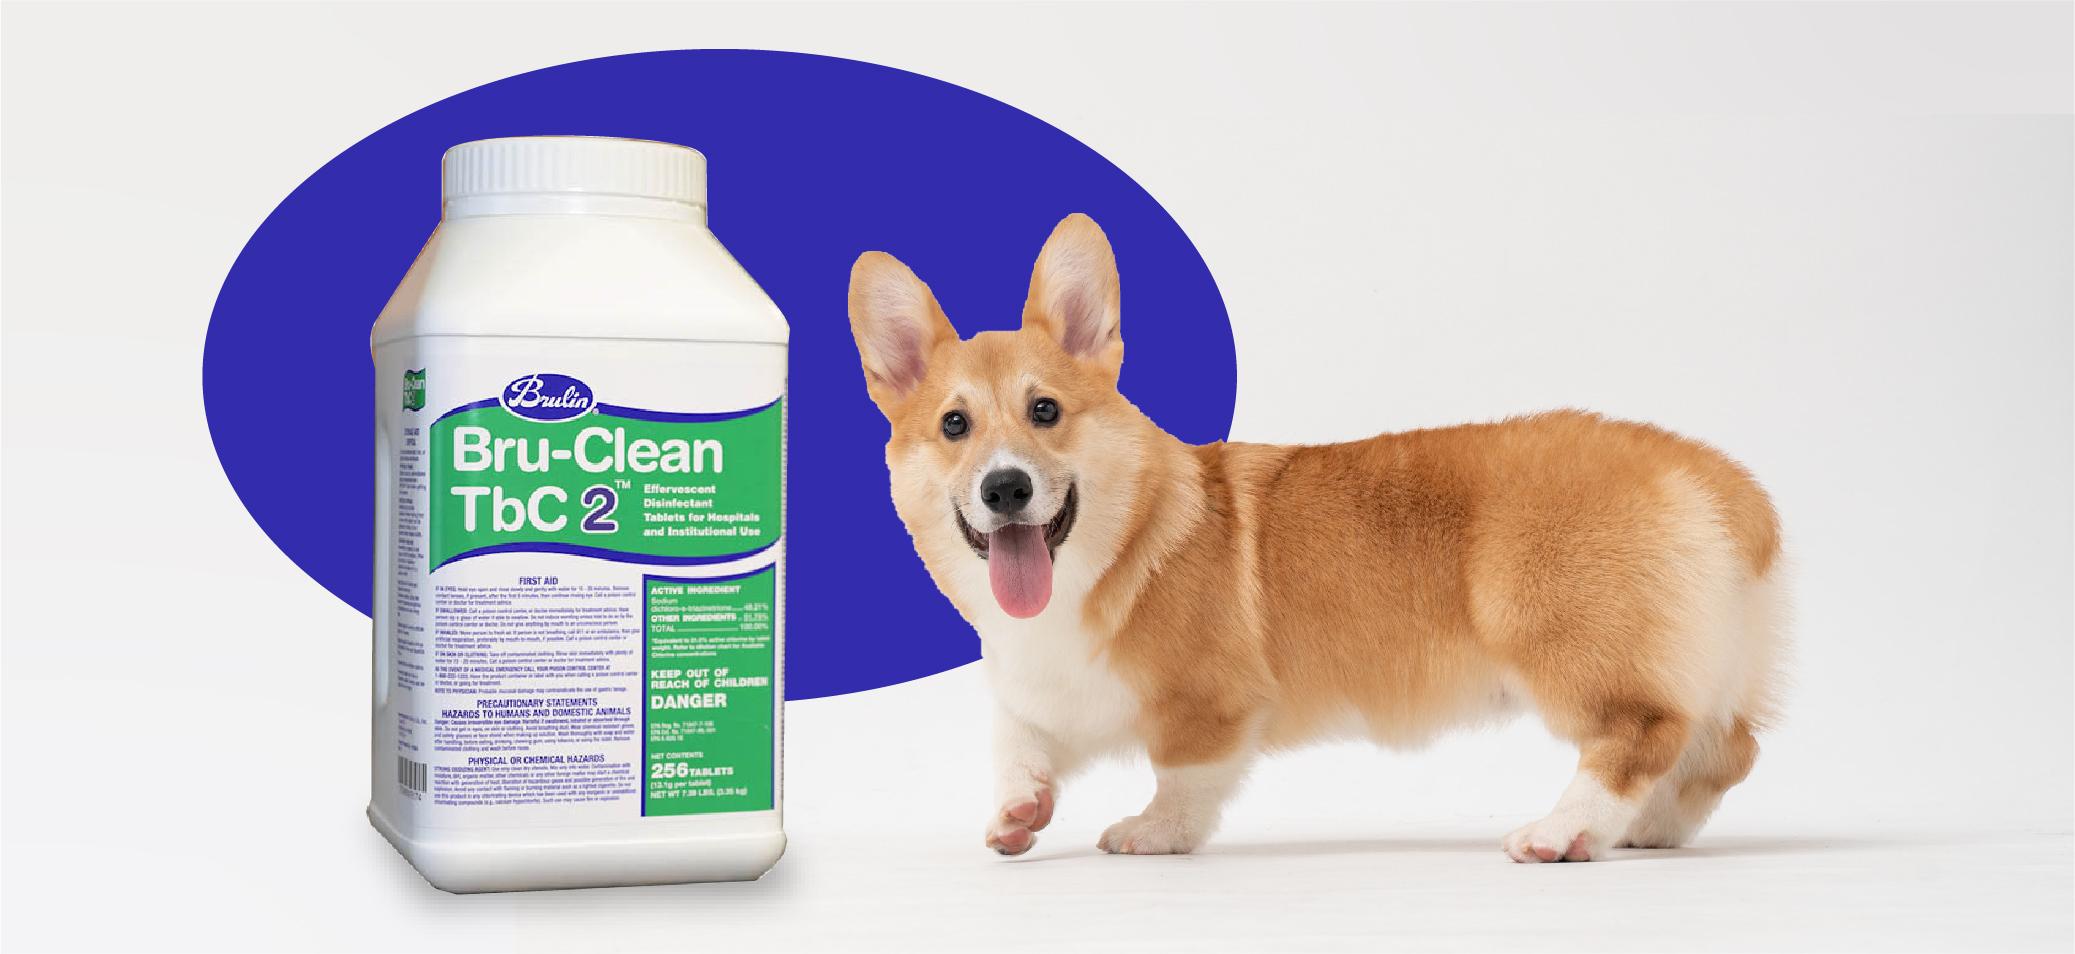 Bru-Clean TbC 2 Effervescent Tablet Disinfectant